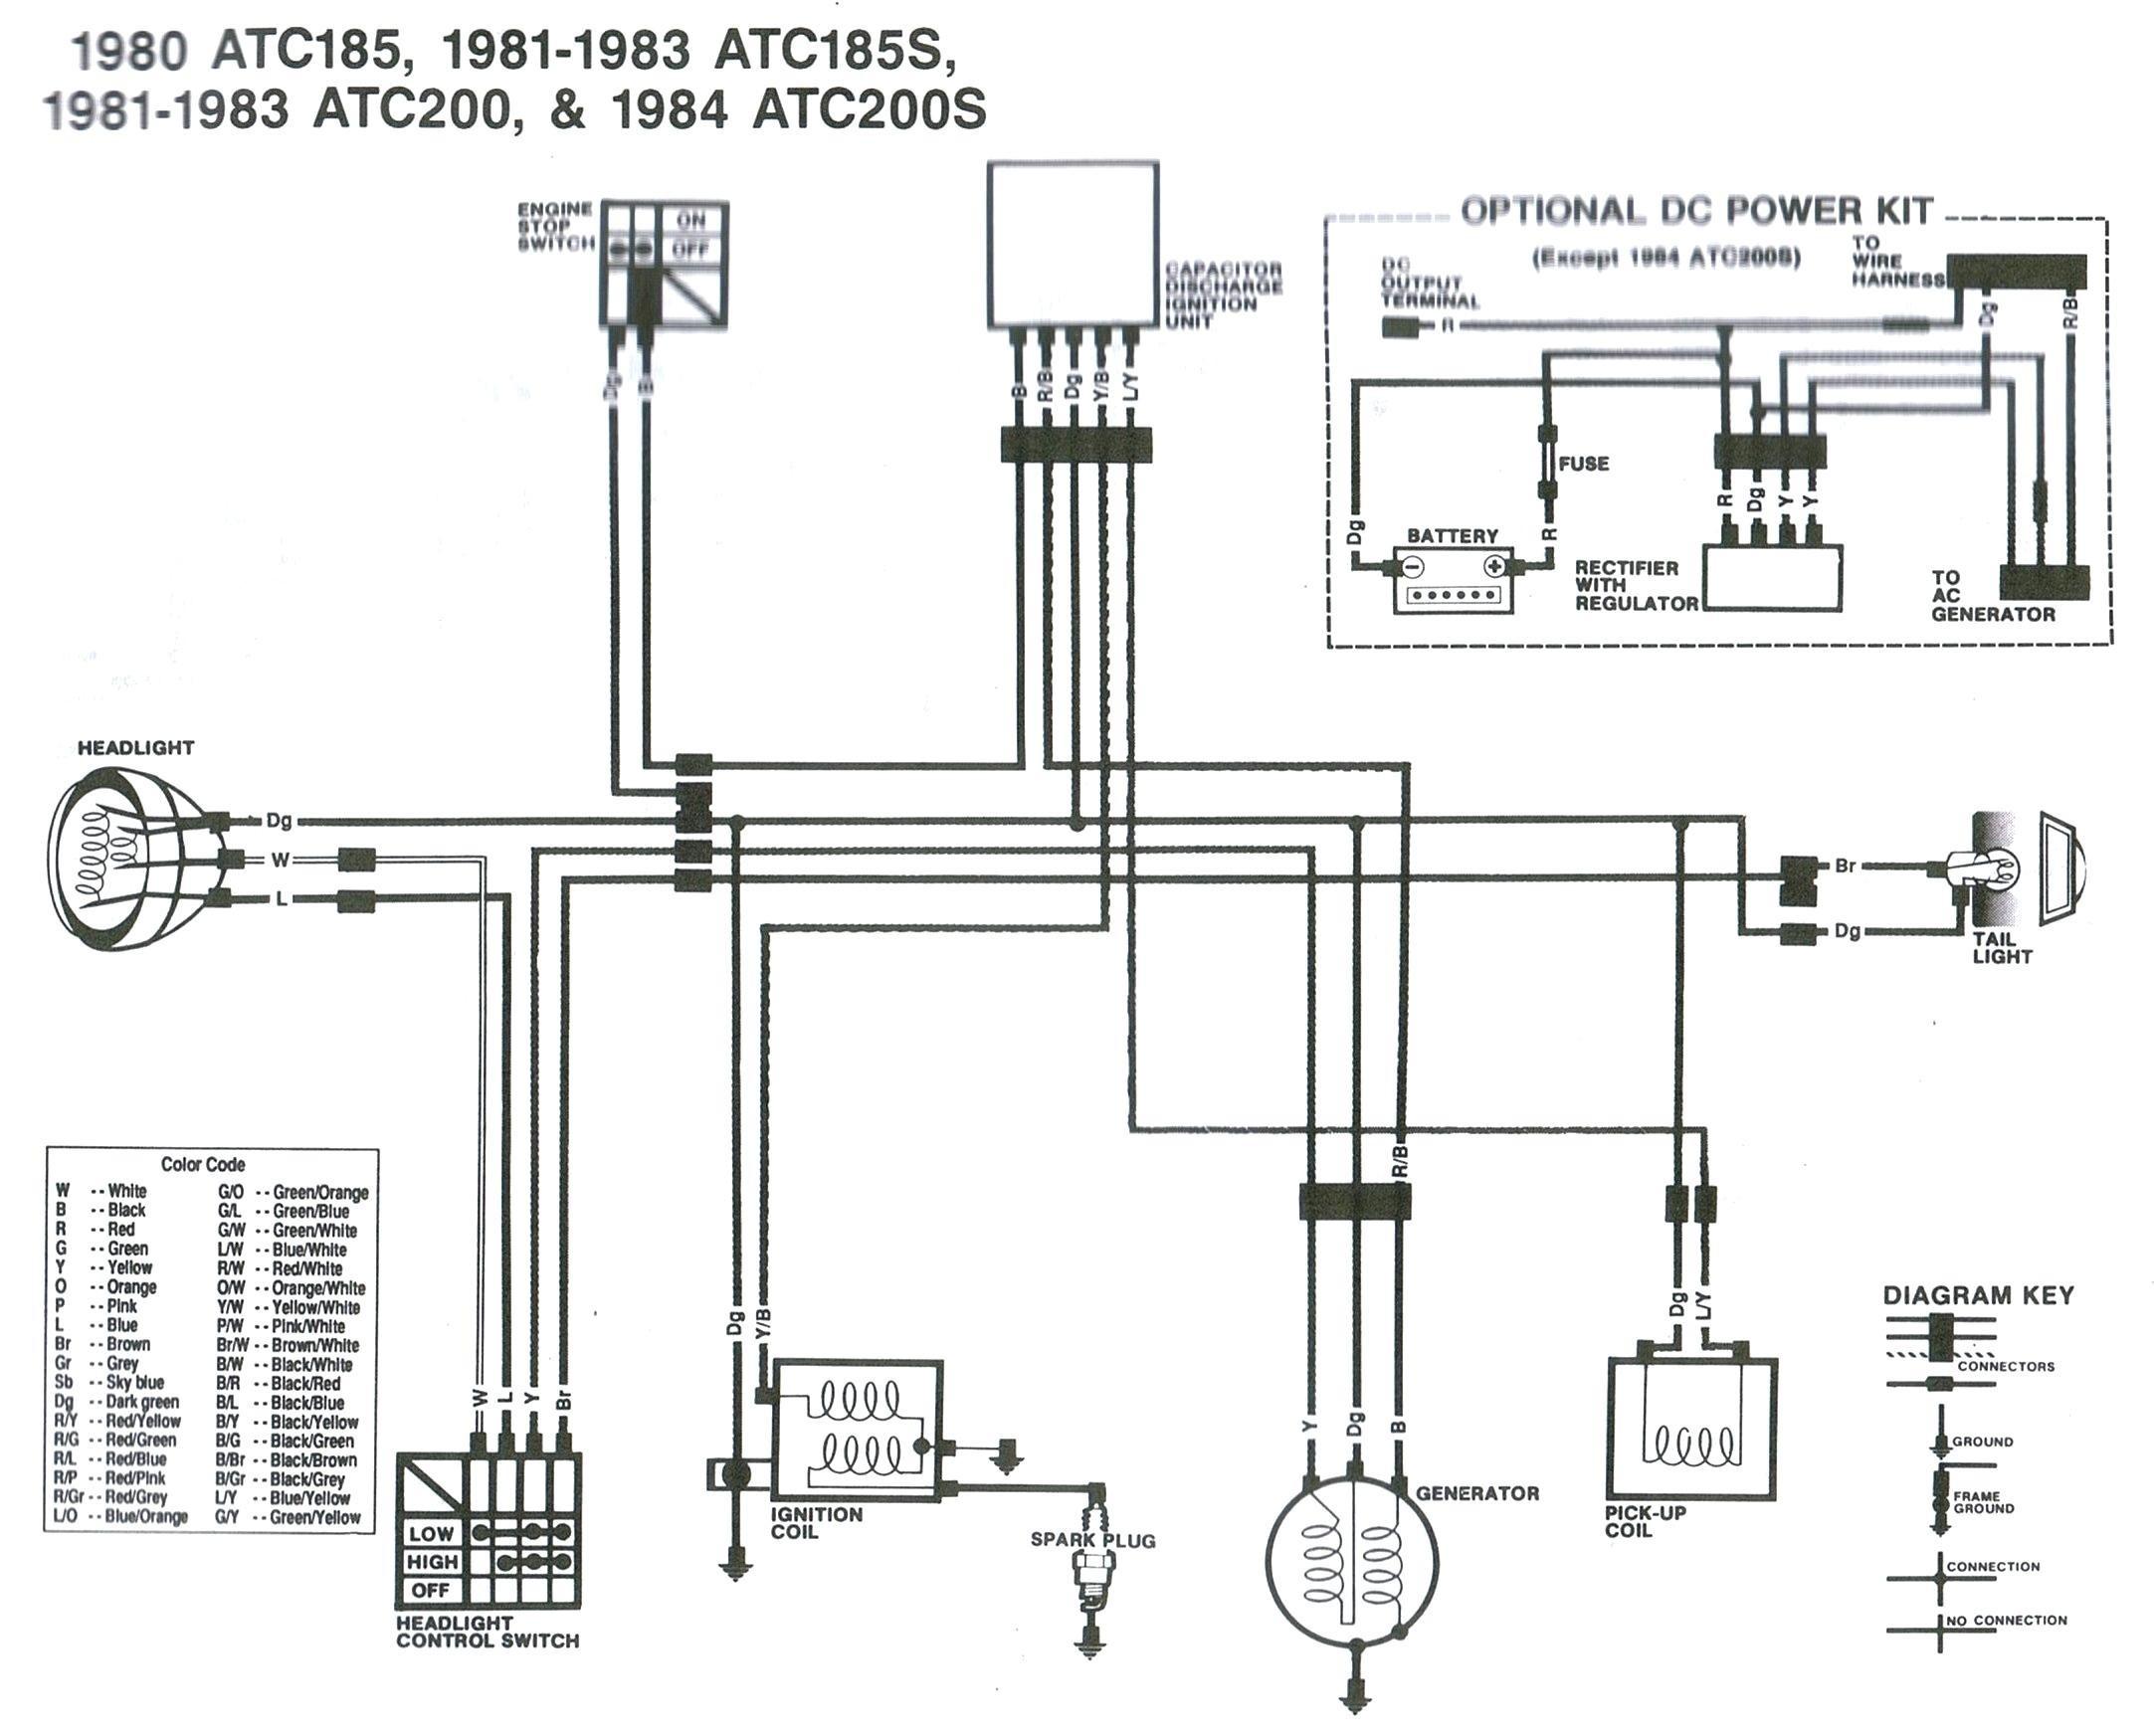 1980 Toyota Pick Up Ignition Wiring Diagram - Everfocus Wiring Diagram -  source-auto4.yenpancane.jeanjaures37.fr | 1980 Toyota Pick Up Ignition Wiring Diagram |  | Wiring Diagram Resource